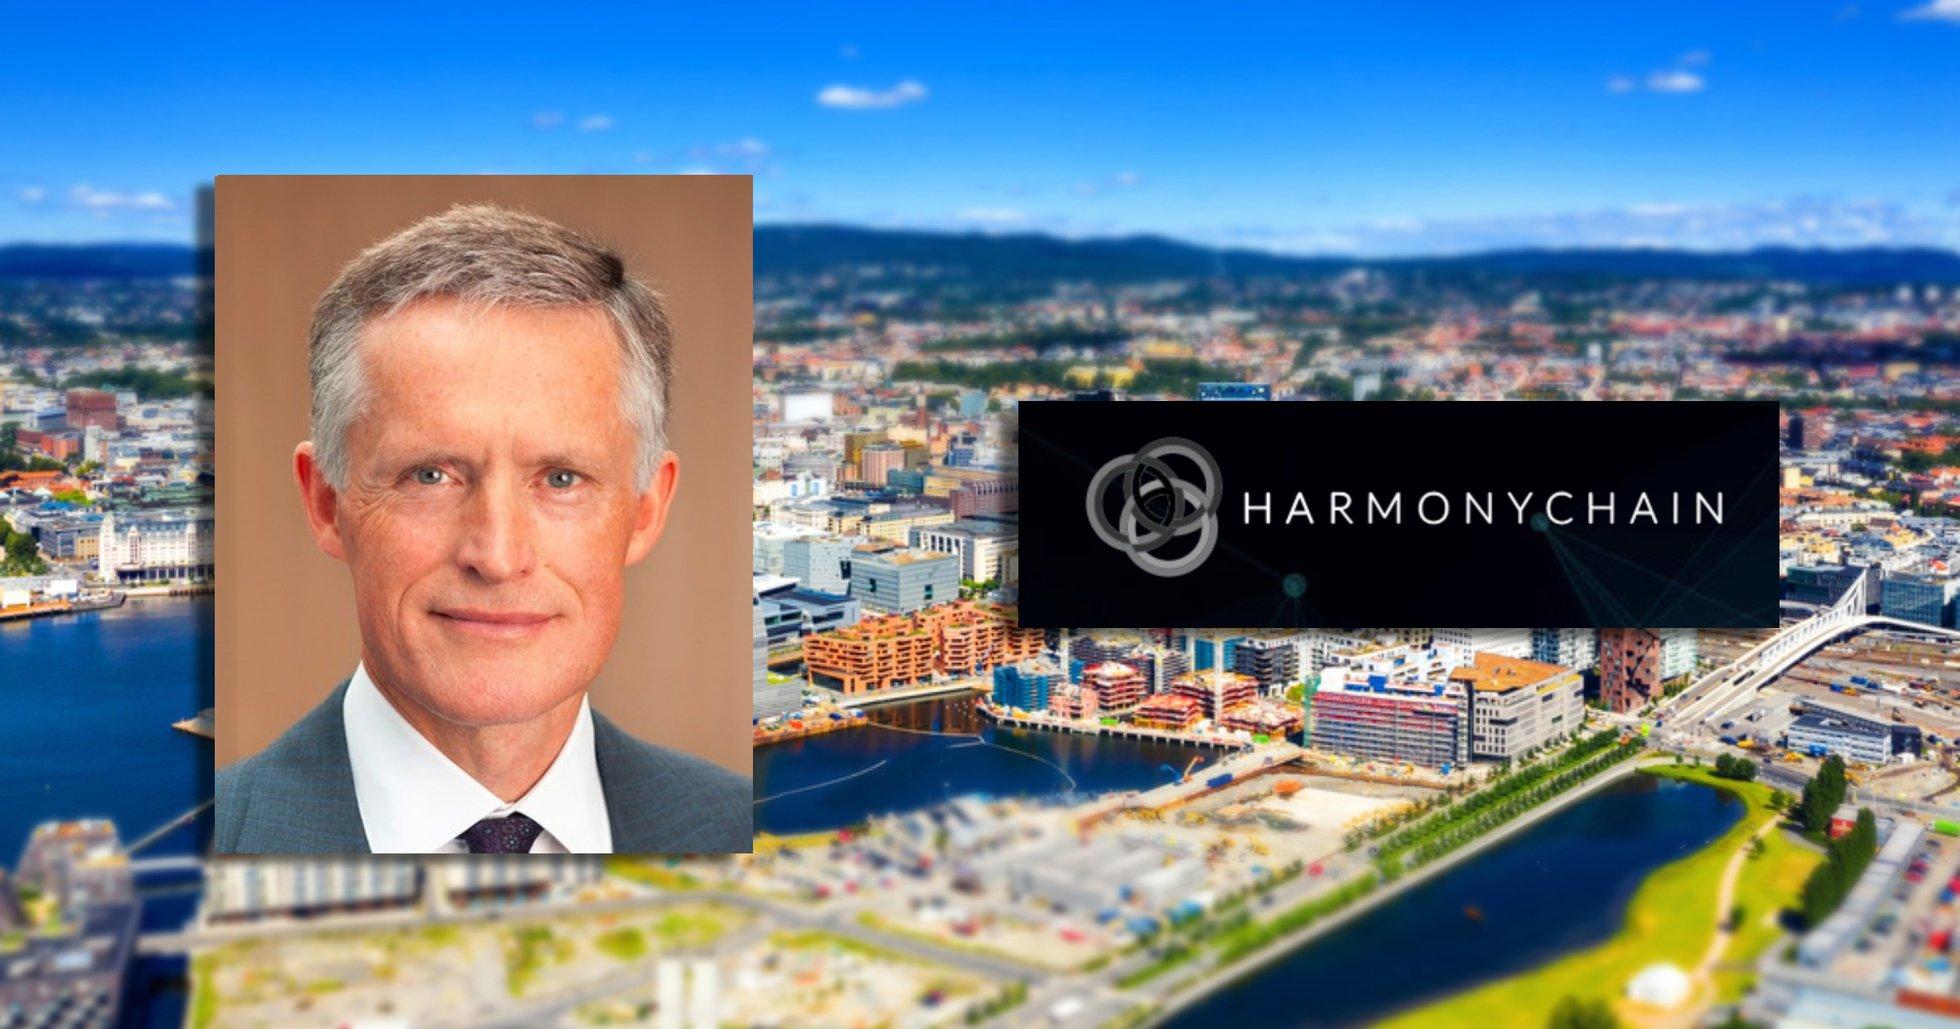 Norges fjärde rikaste man investerar i kryptobolaget Harmonychain